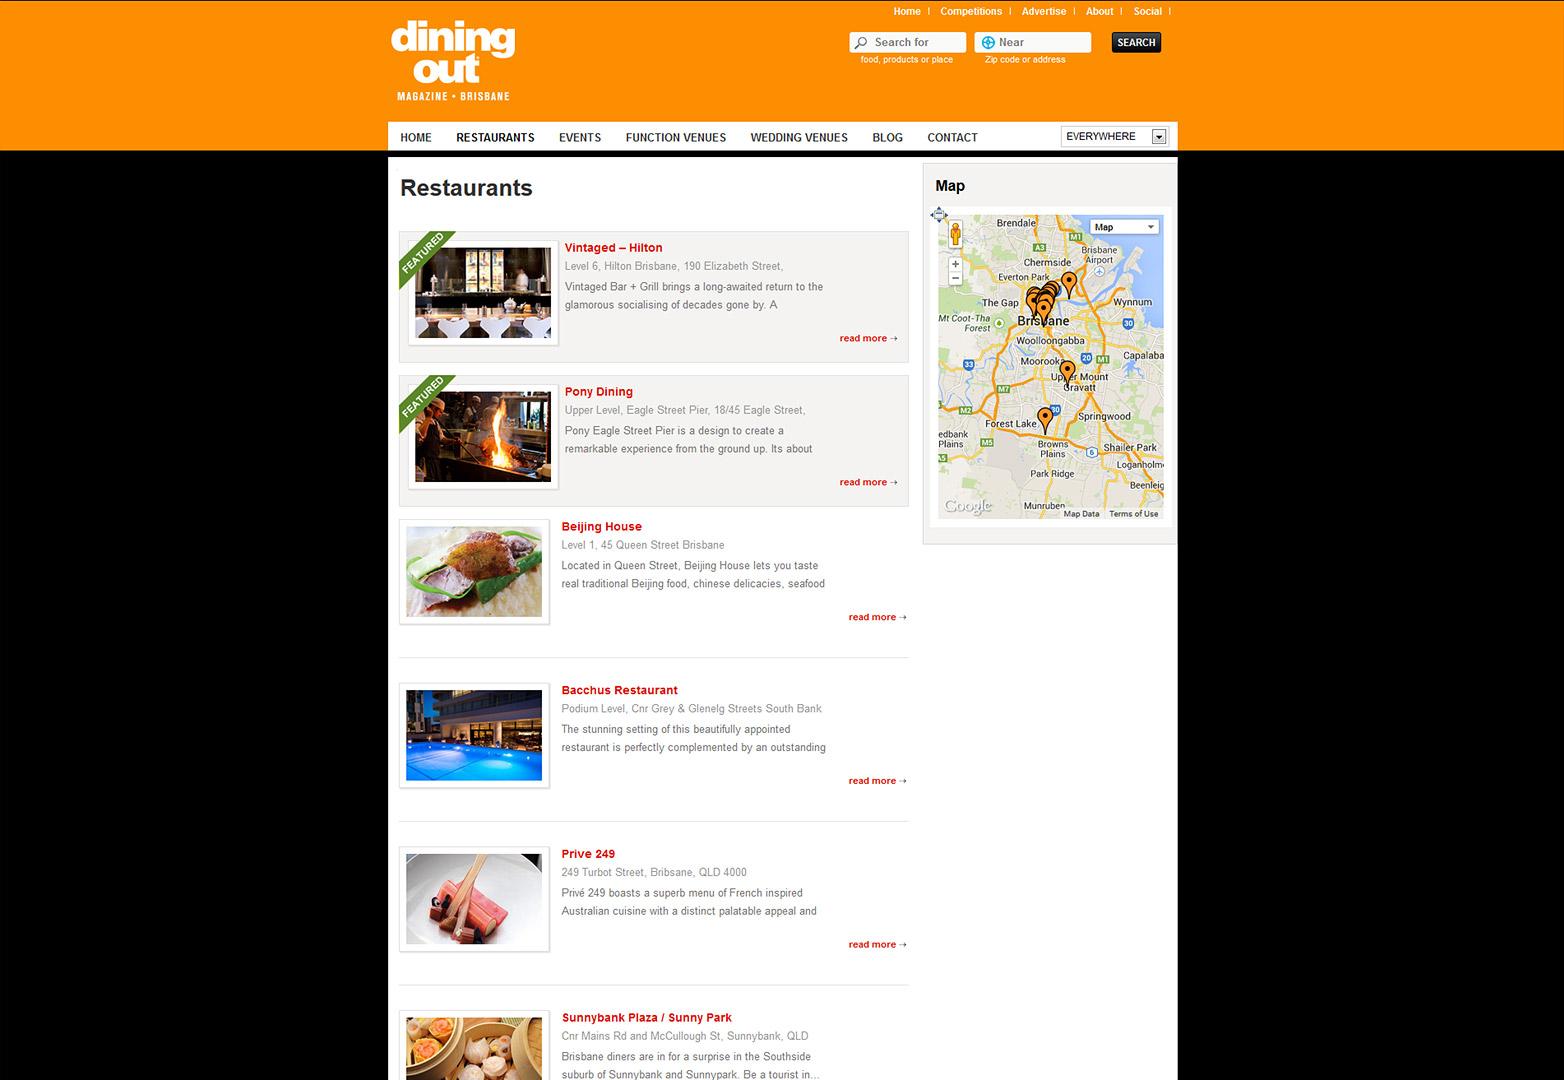 Dining Out Magazine Brisbane's Restaurants page